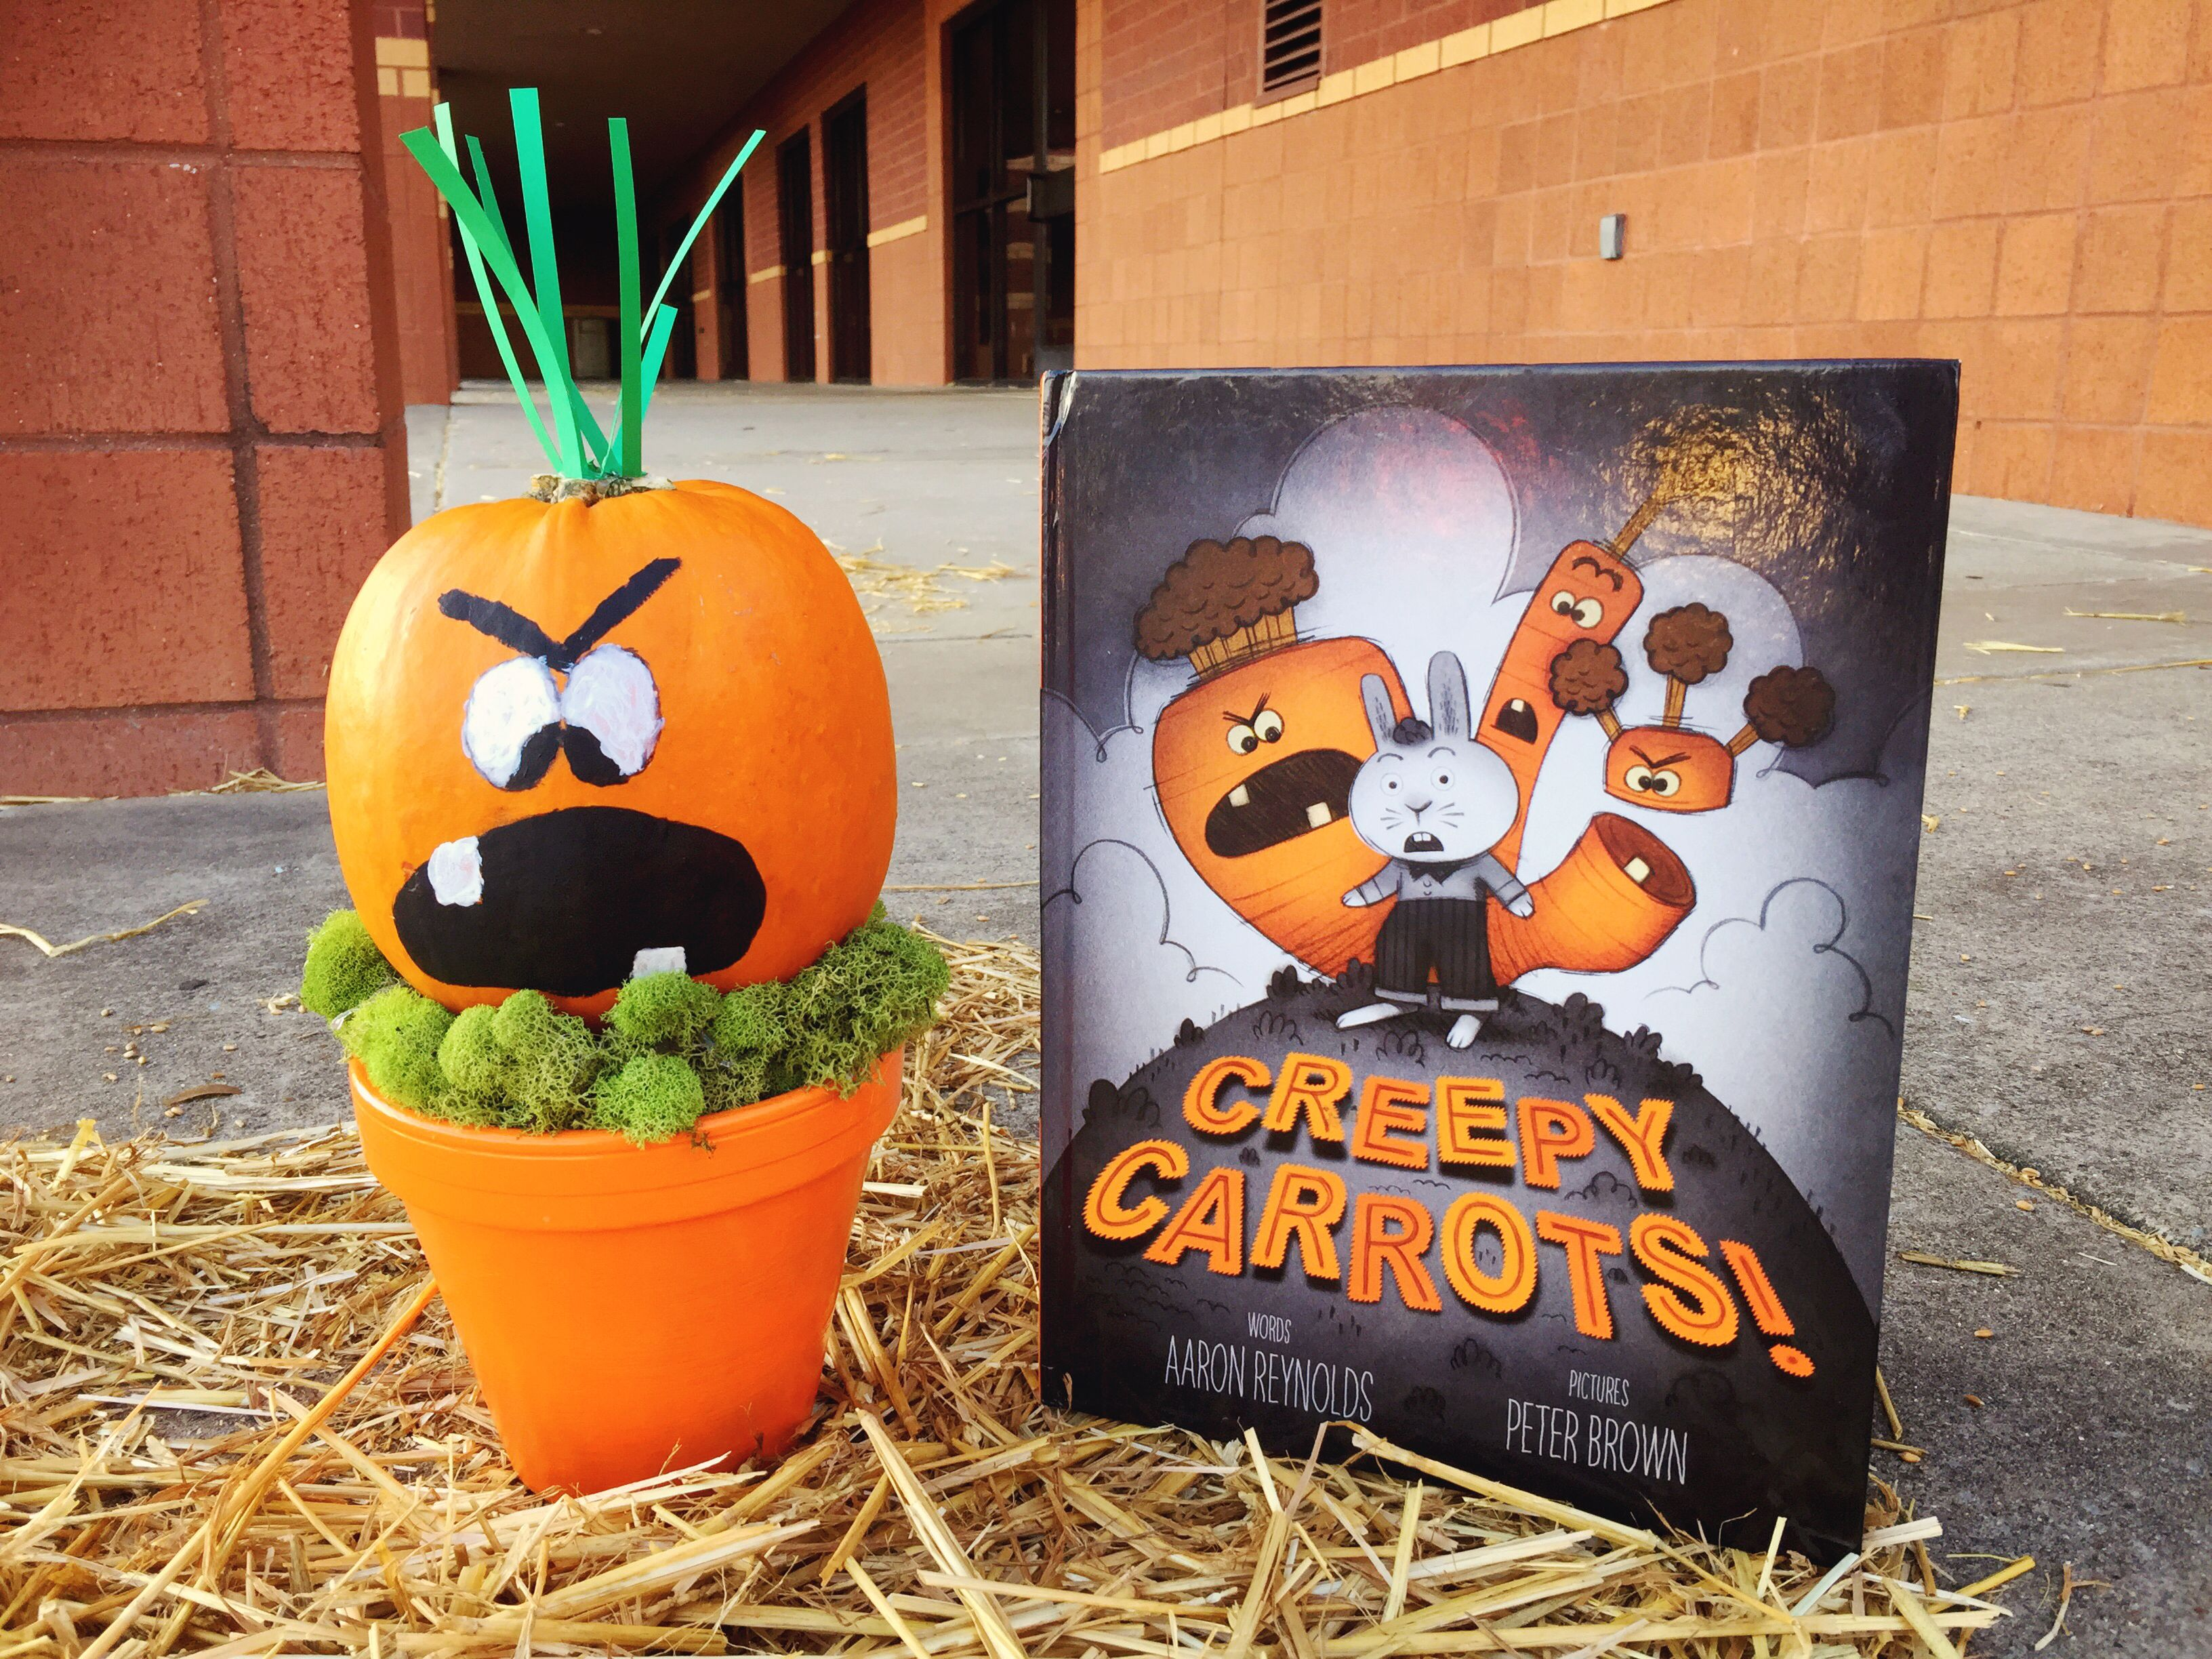 Book Character Pumpkin Creepy Carrots By Aaron Reynolds Book Character Pumpkins Character Pumpkins Pumpkin Books